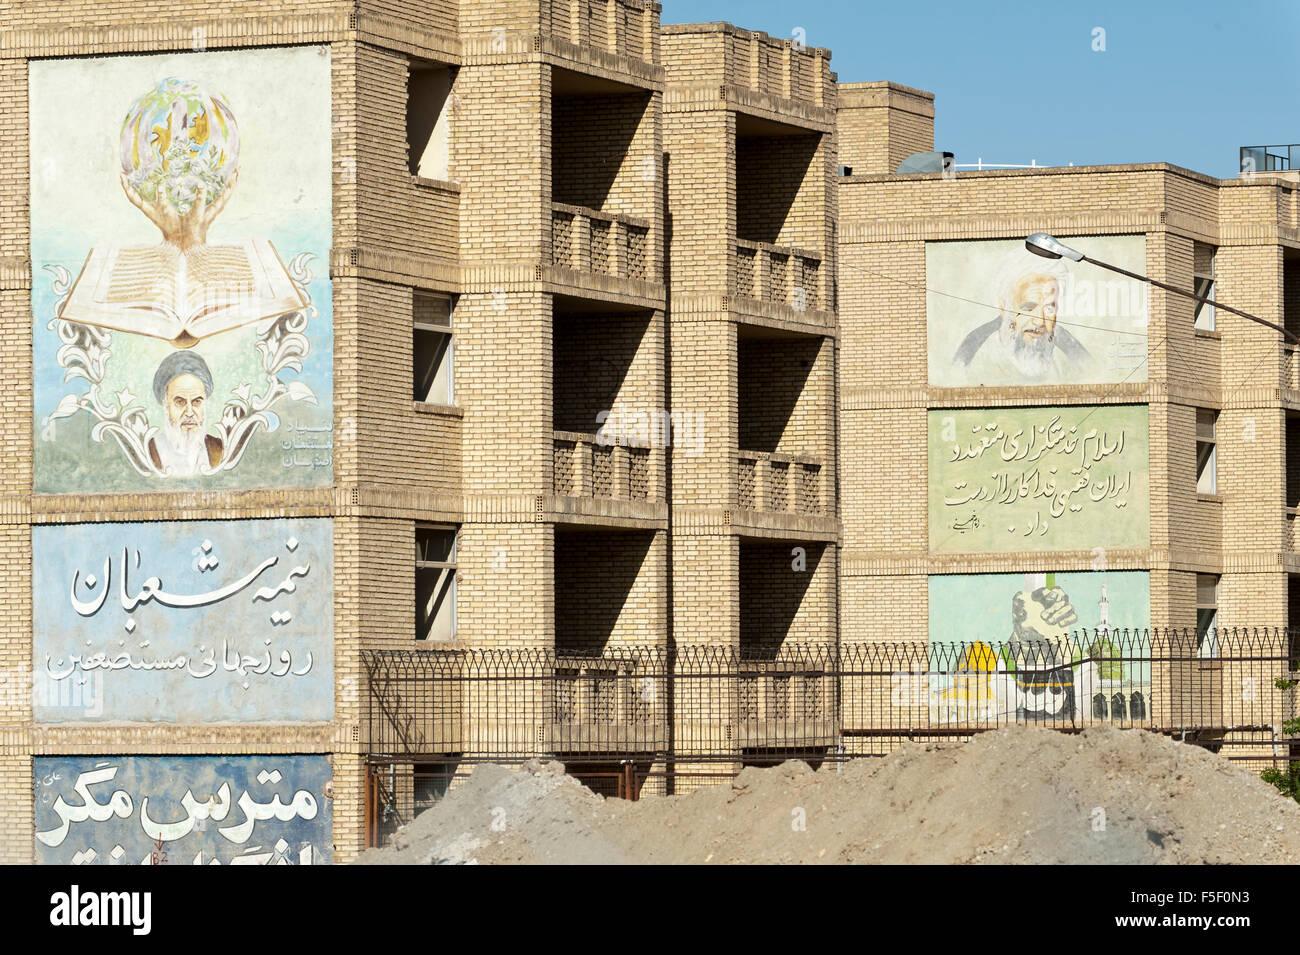 Mural, propaganda on school, Ayatollah Khomeini, Isfahan, Iran - Stock Image